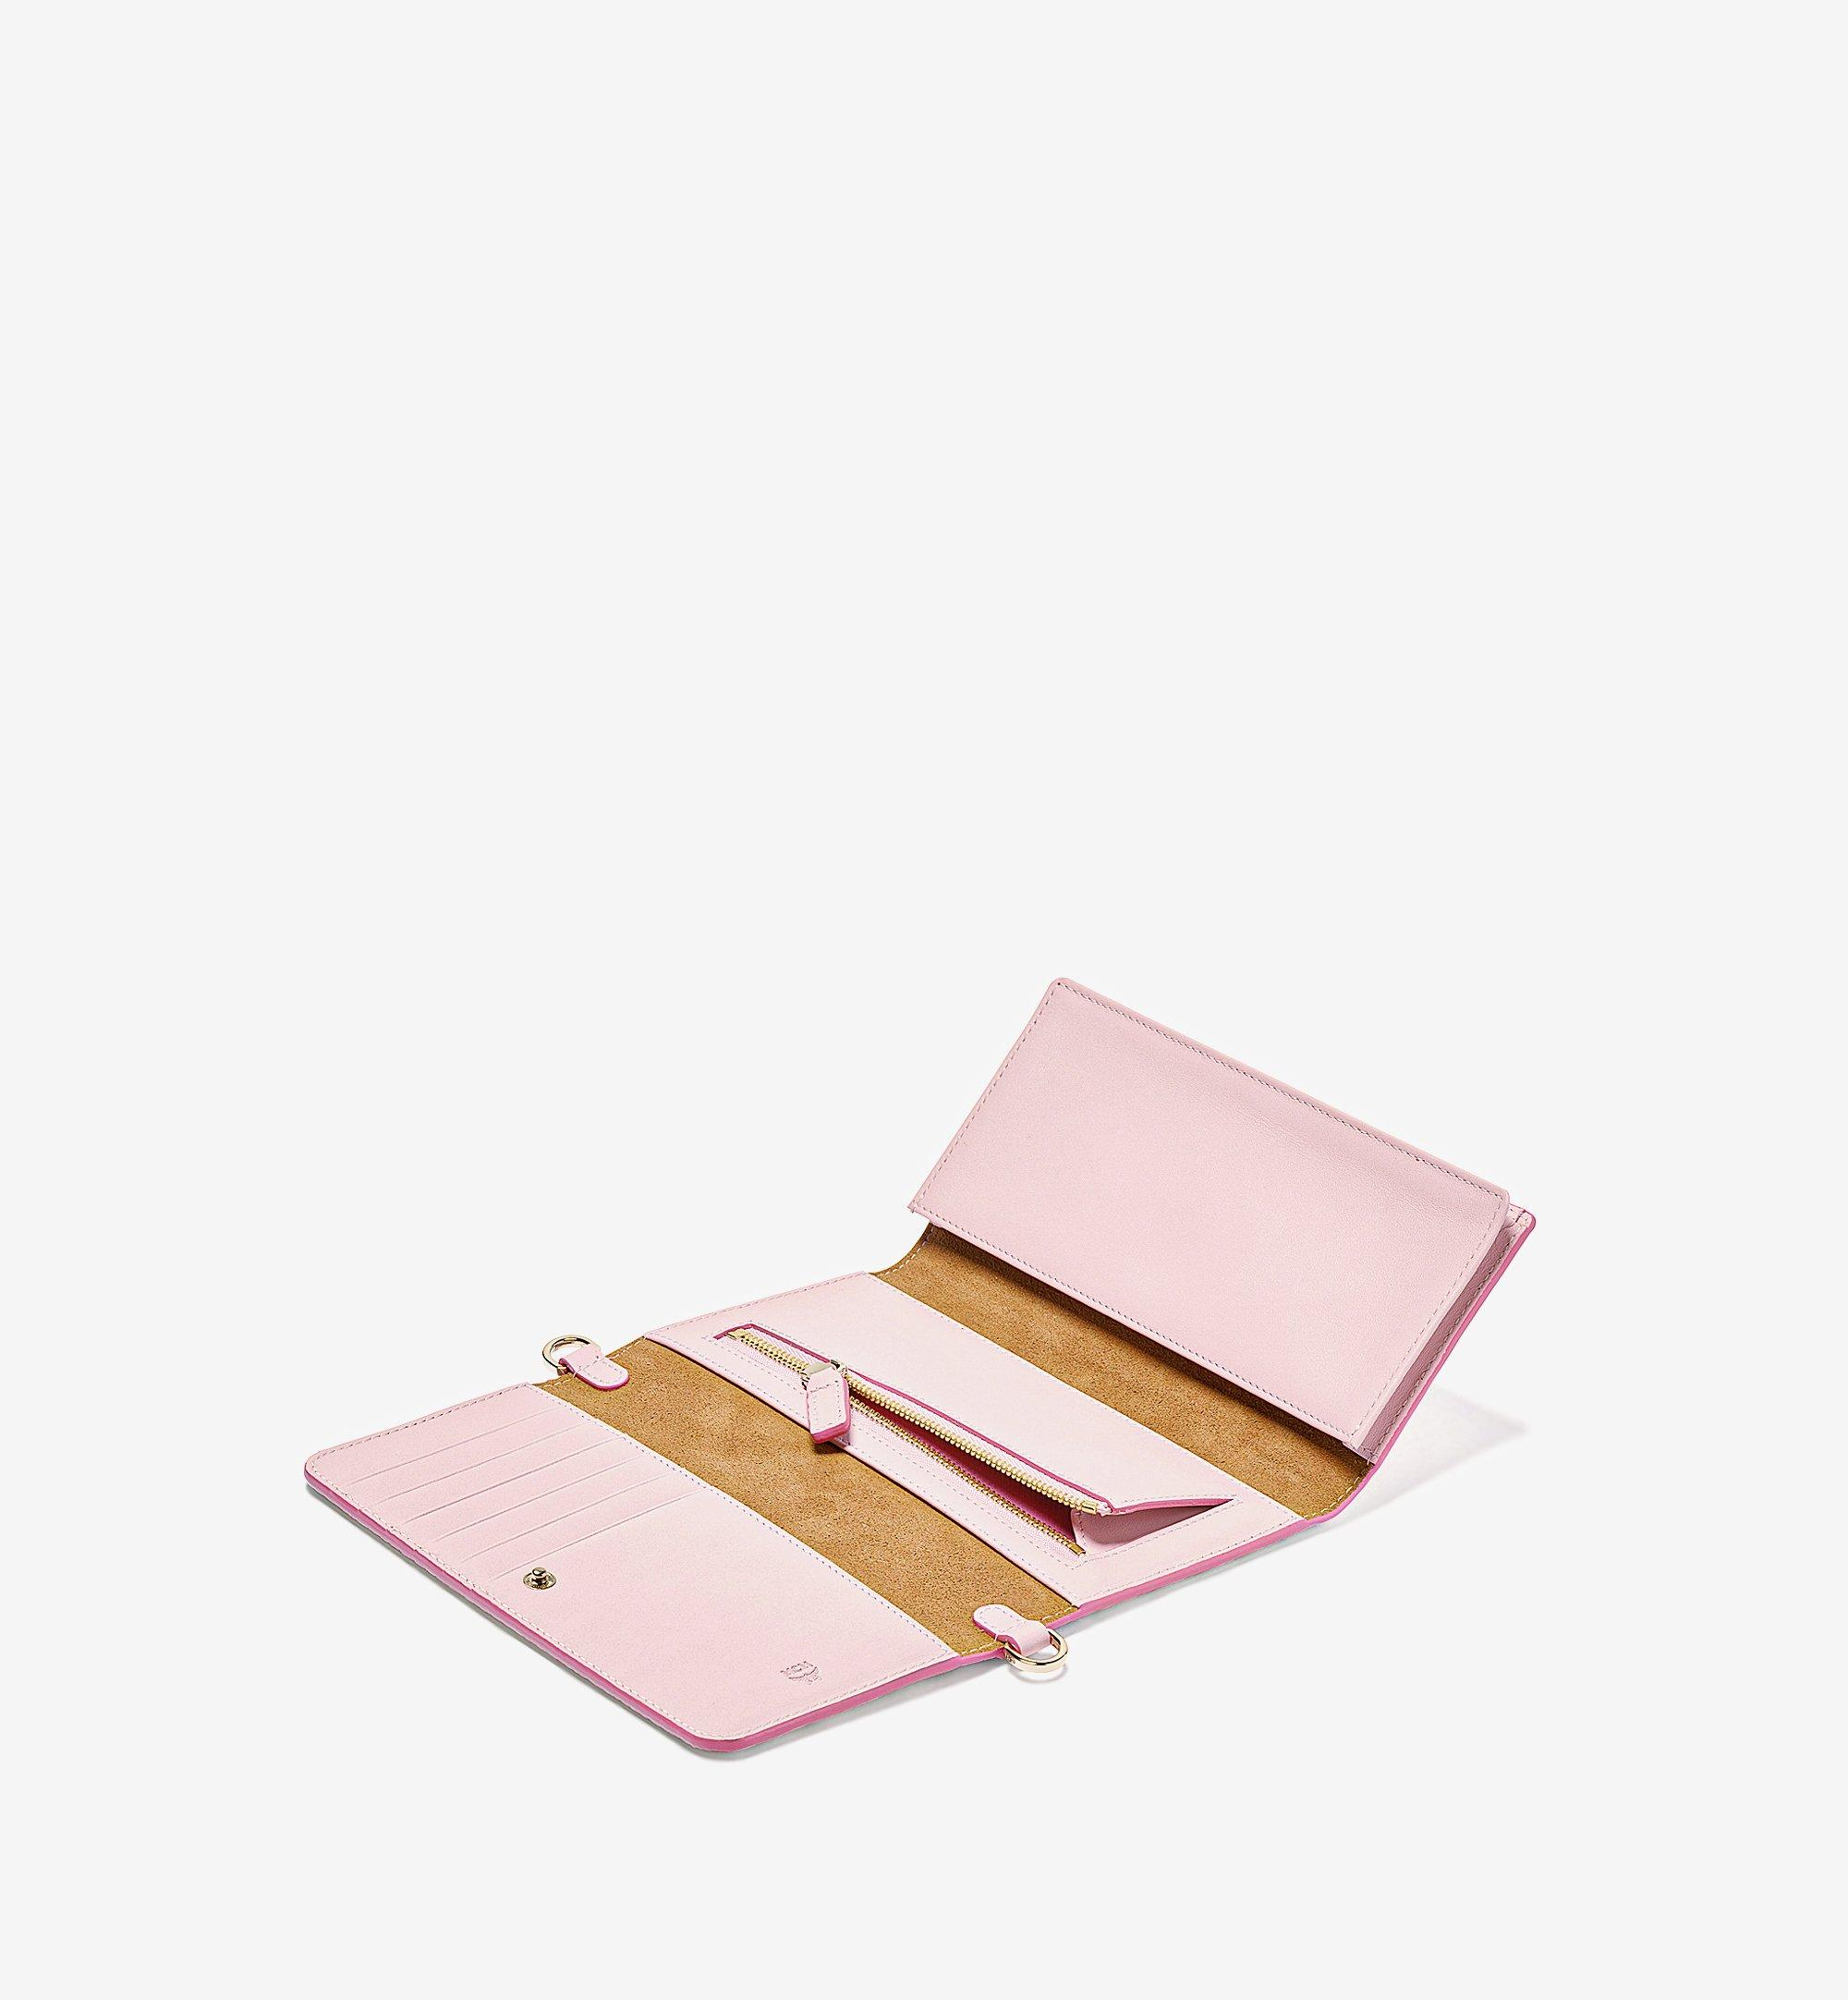 MCM Crossbody Phone Wallet in Visetos Original Pink MXEBSVI01QH001 Alternate View 1